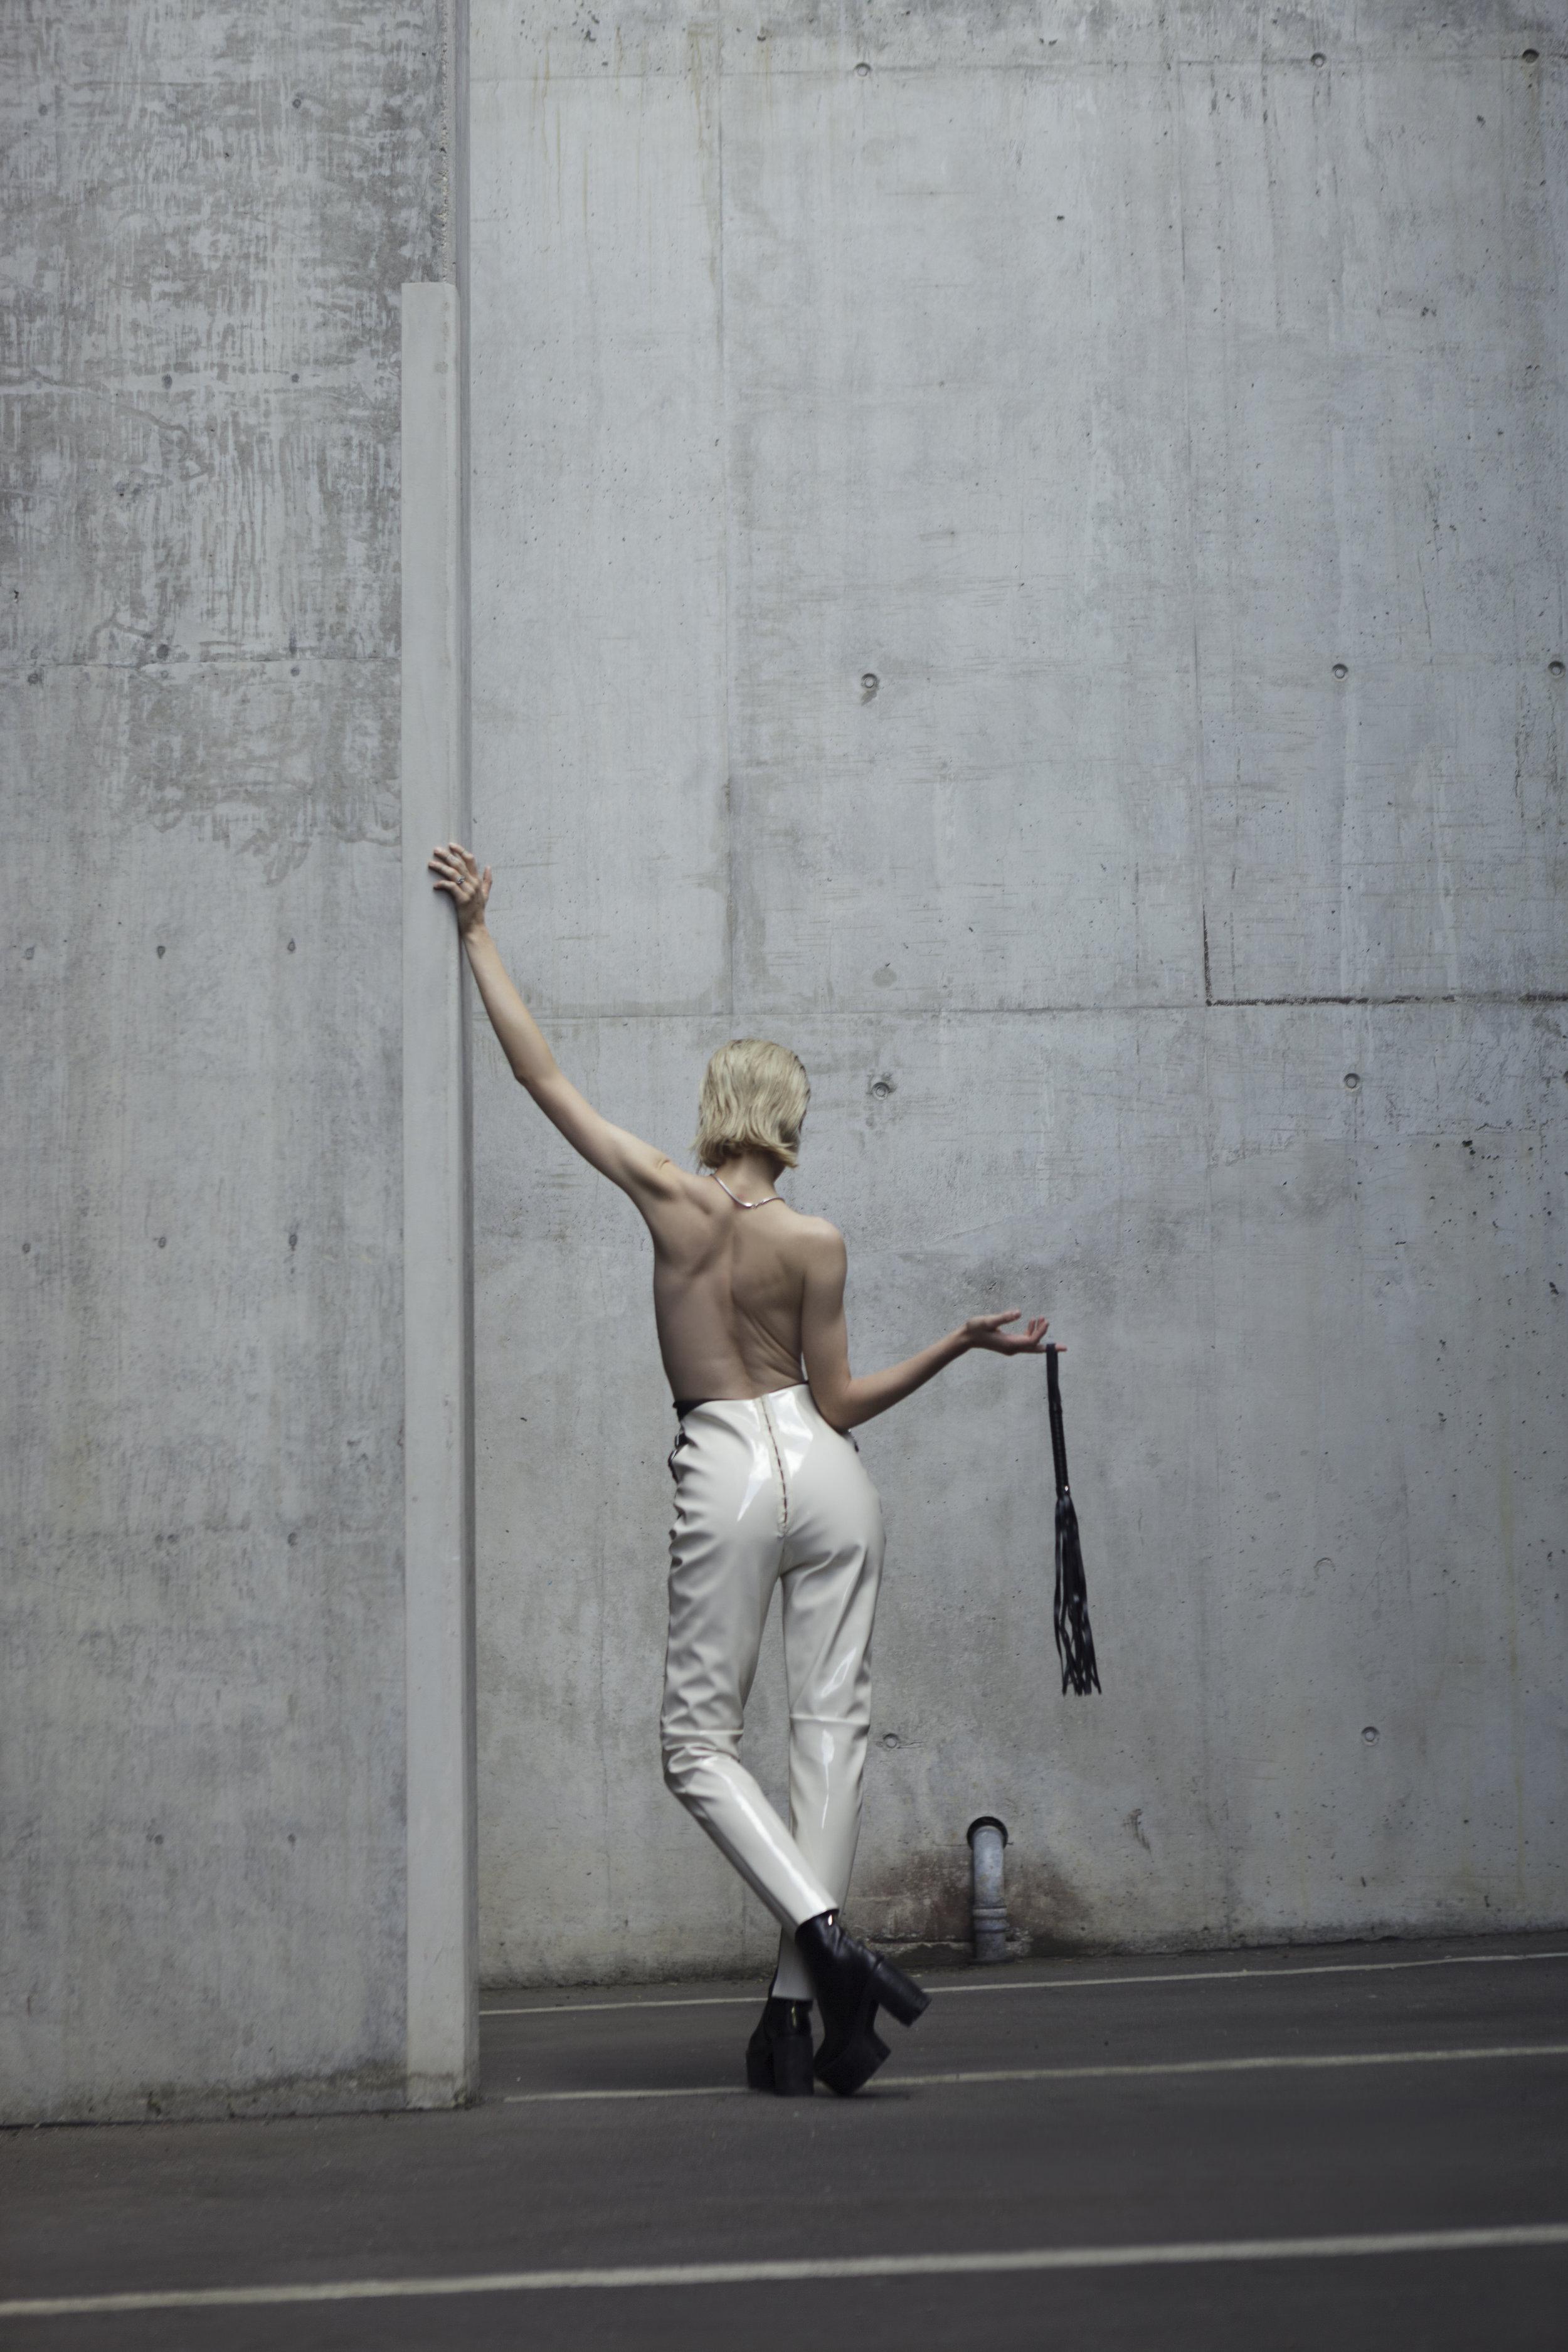 Back-Fashion-Mode-High-Waist-Trouser-Hose-Lack.jpg